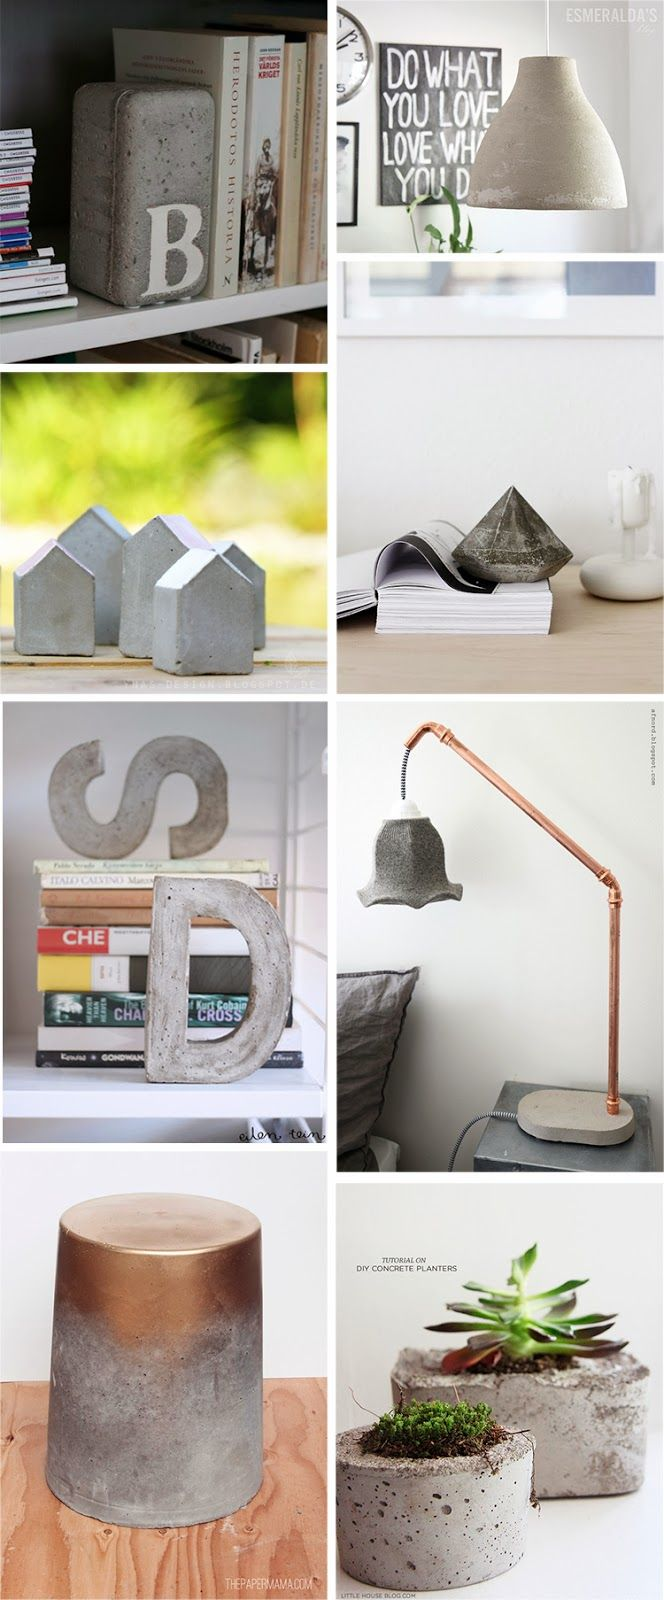 Ohoh Blog - diy and crafts: DIY Monday # Concrete